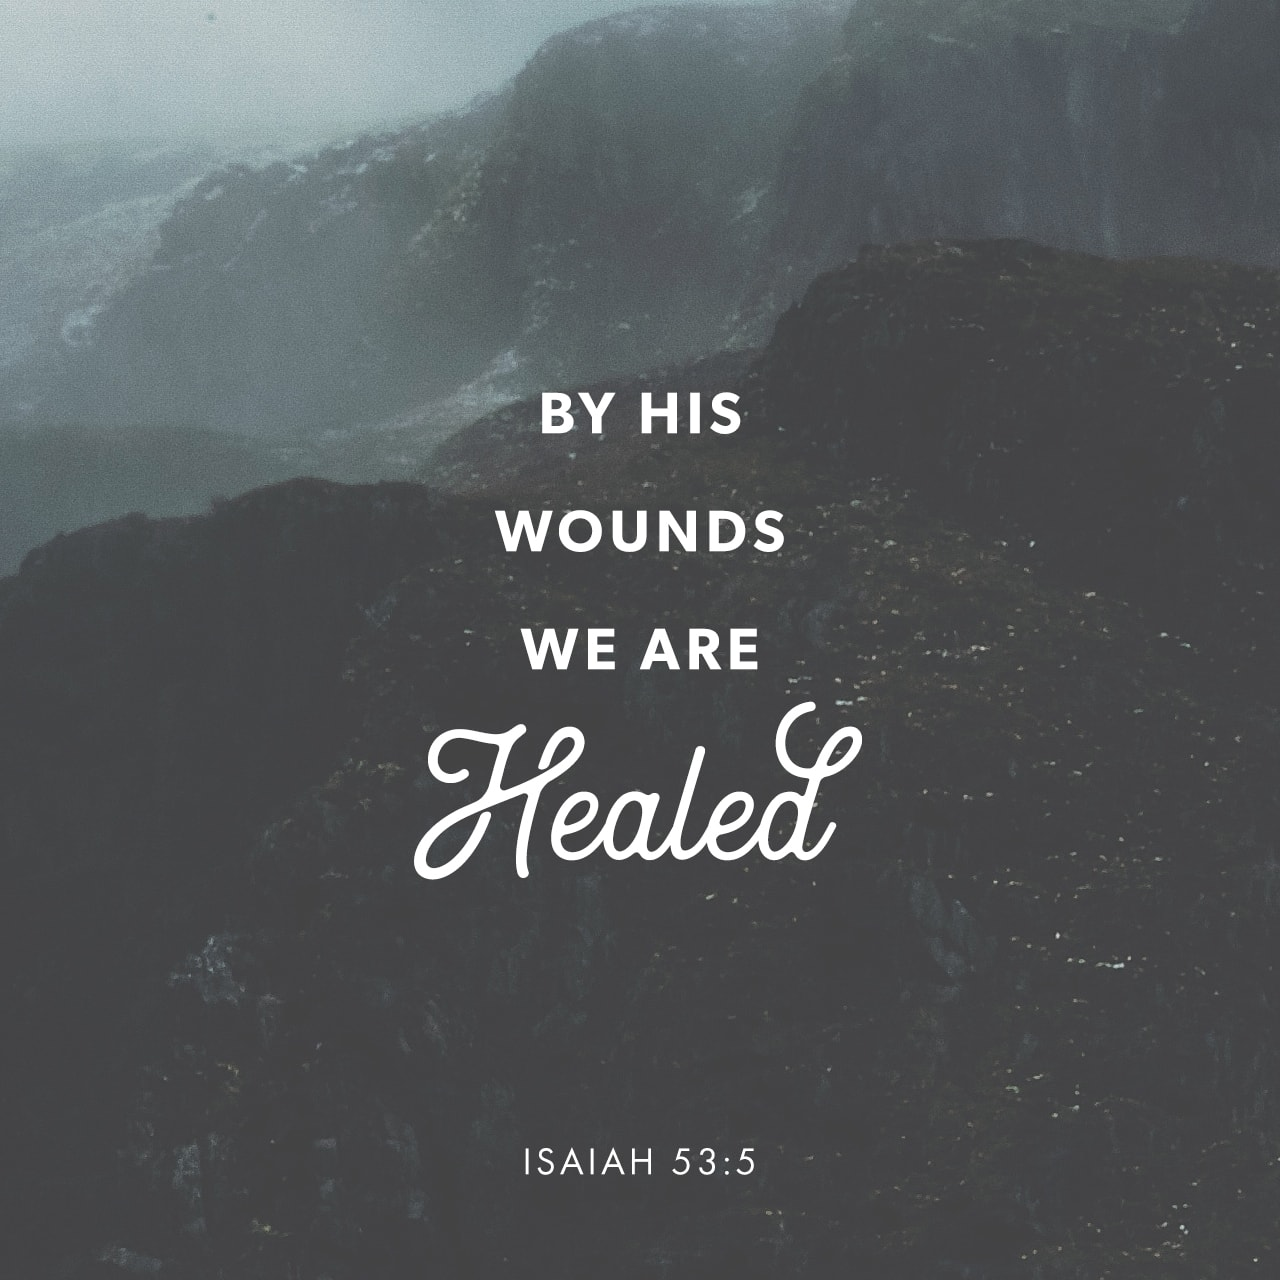 Verse Image: Isaiah 53:5, New International Version